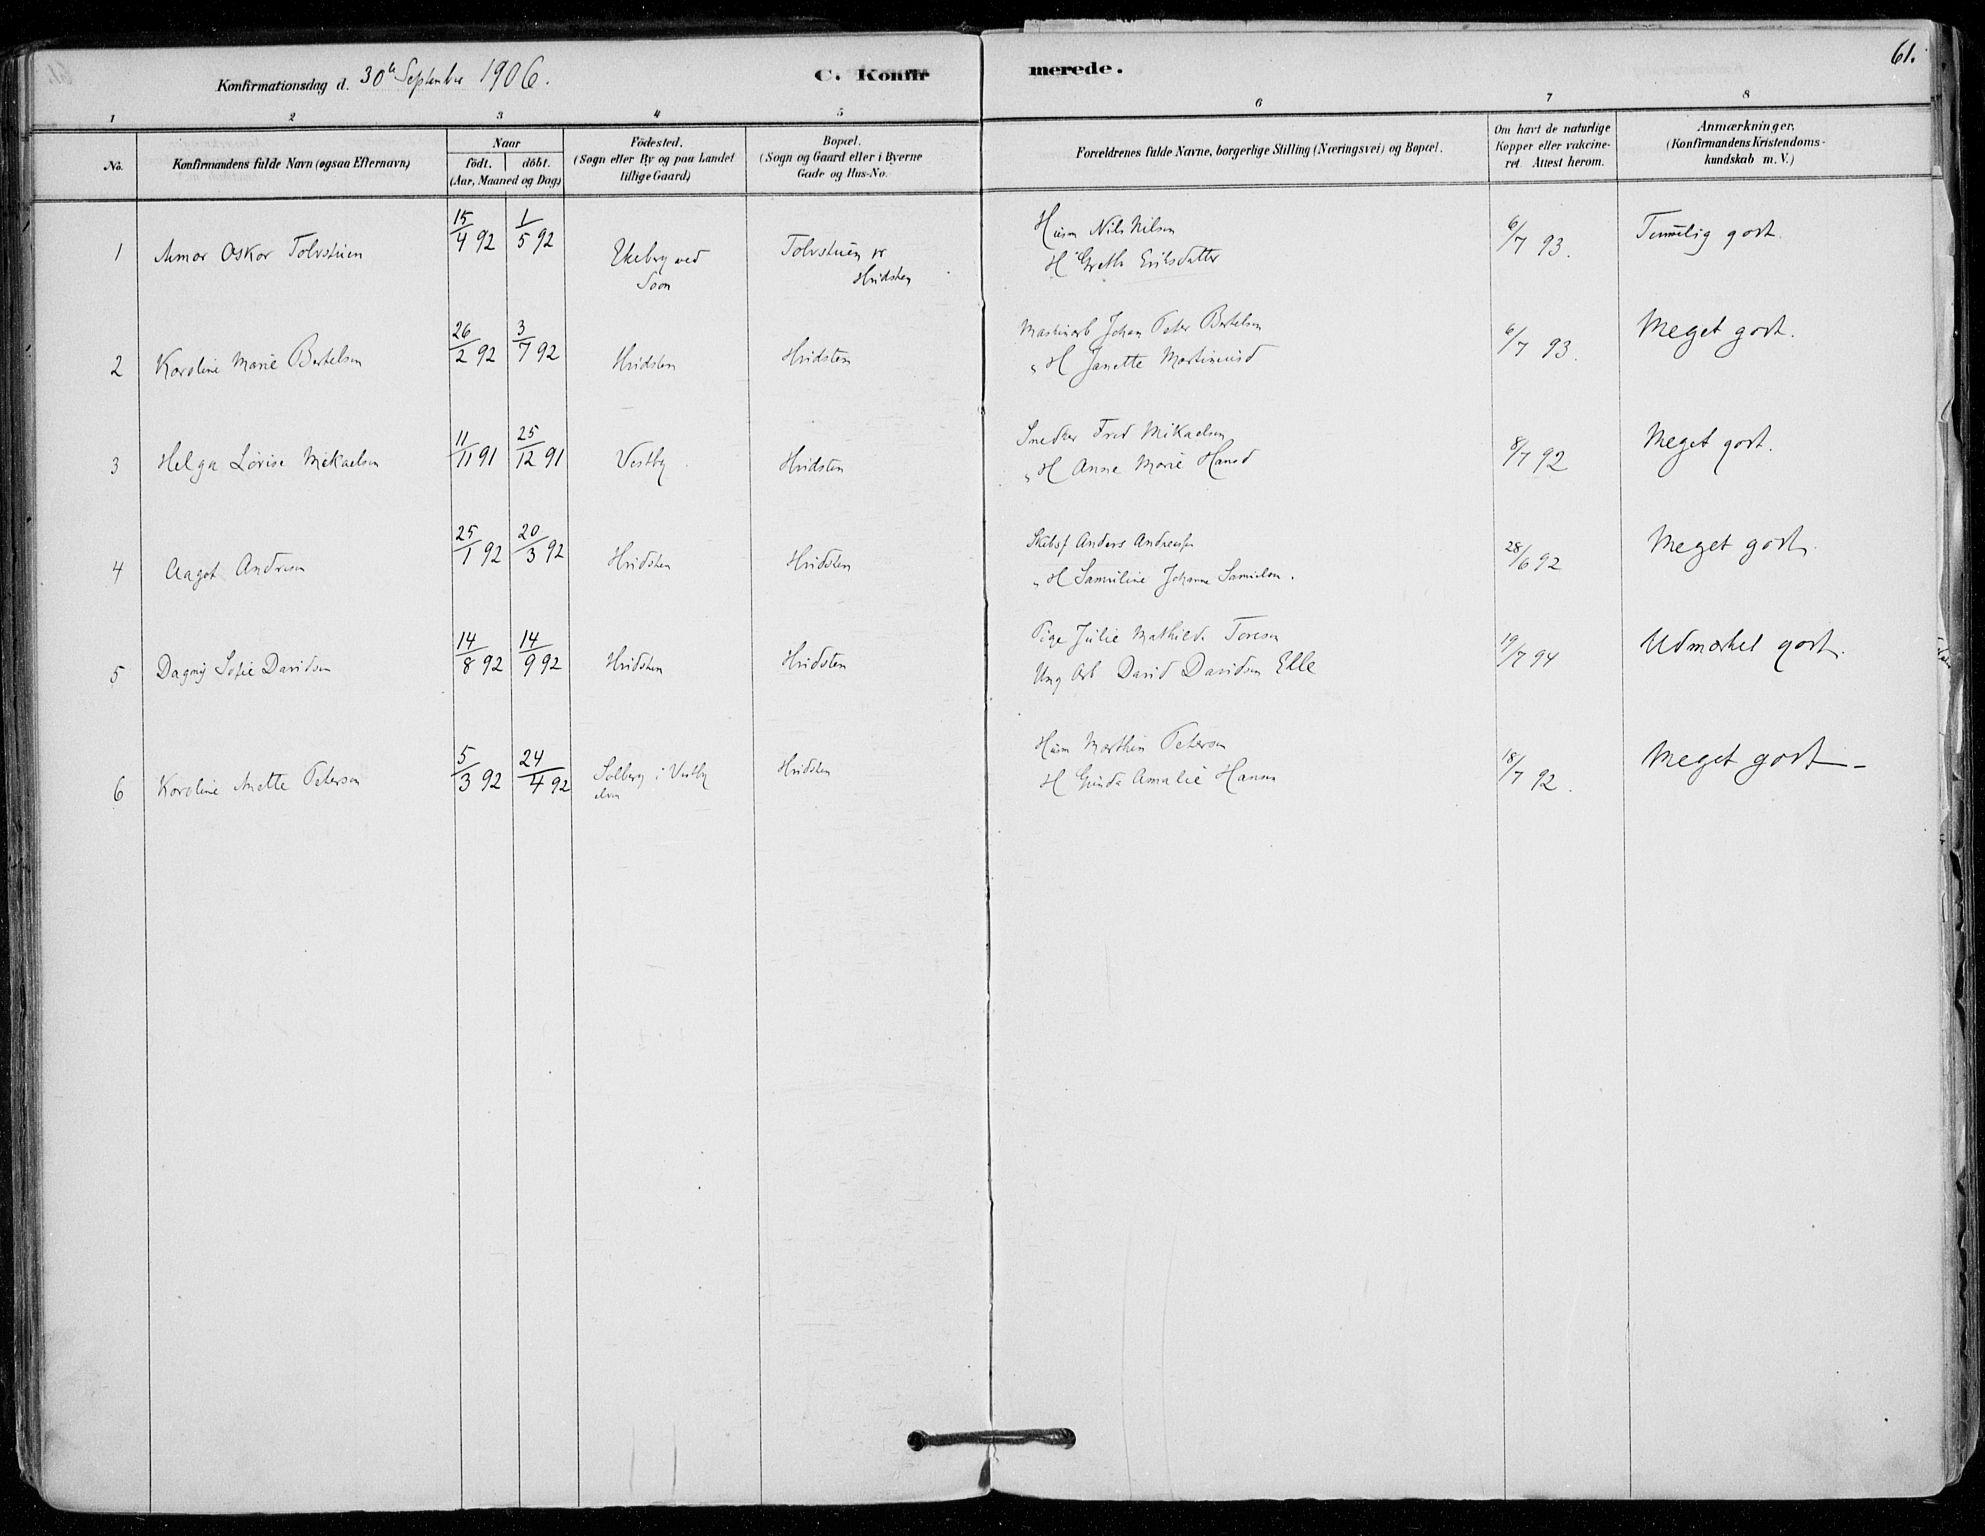 SAO, Vestby prestekontor Kirkebøker, F/Fd/L0001: Ministerialbok nr. IV 1, 1878-1945, s. 61